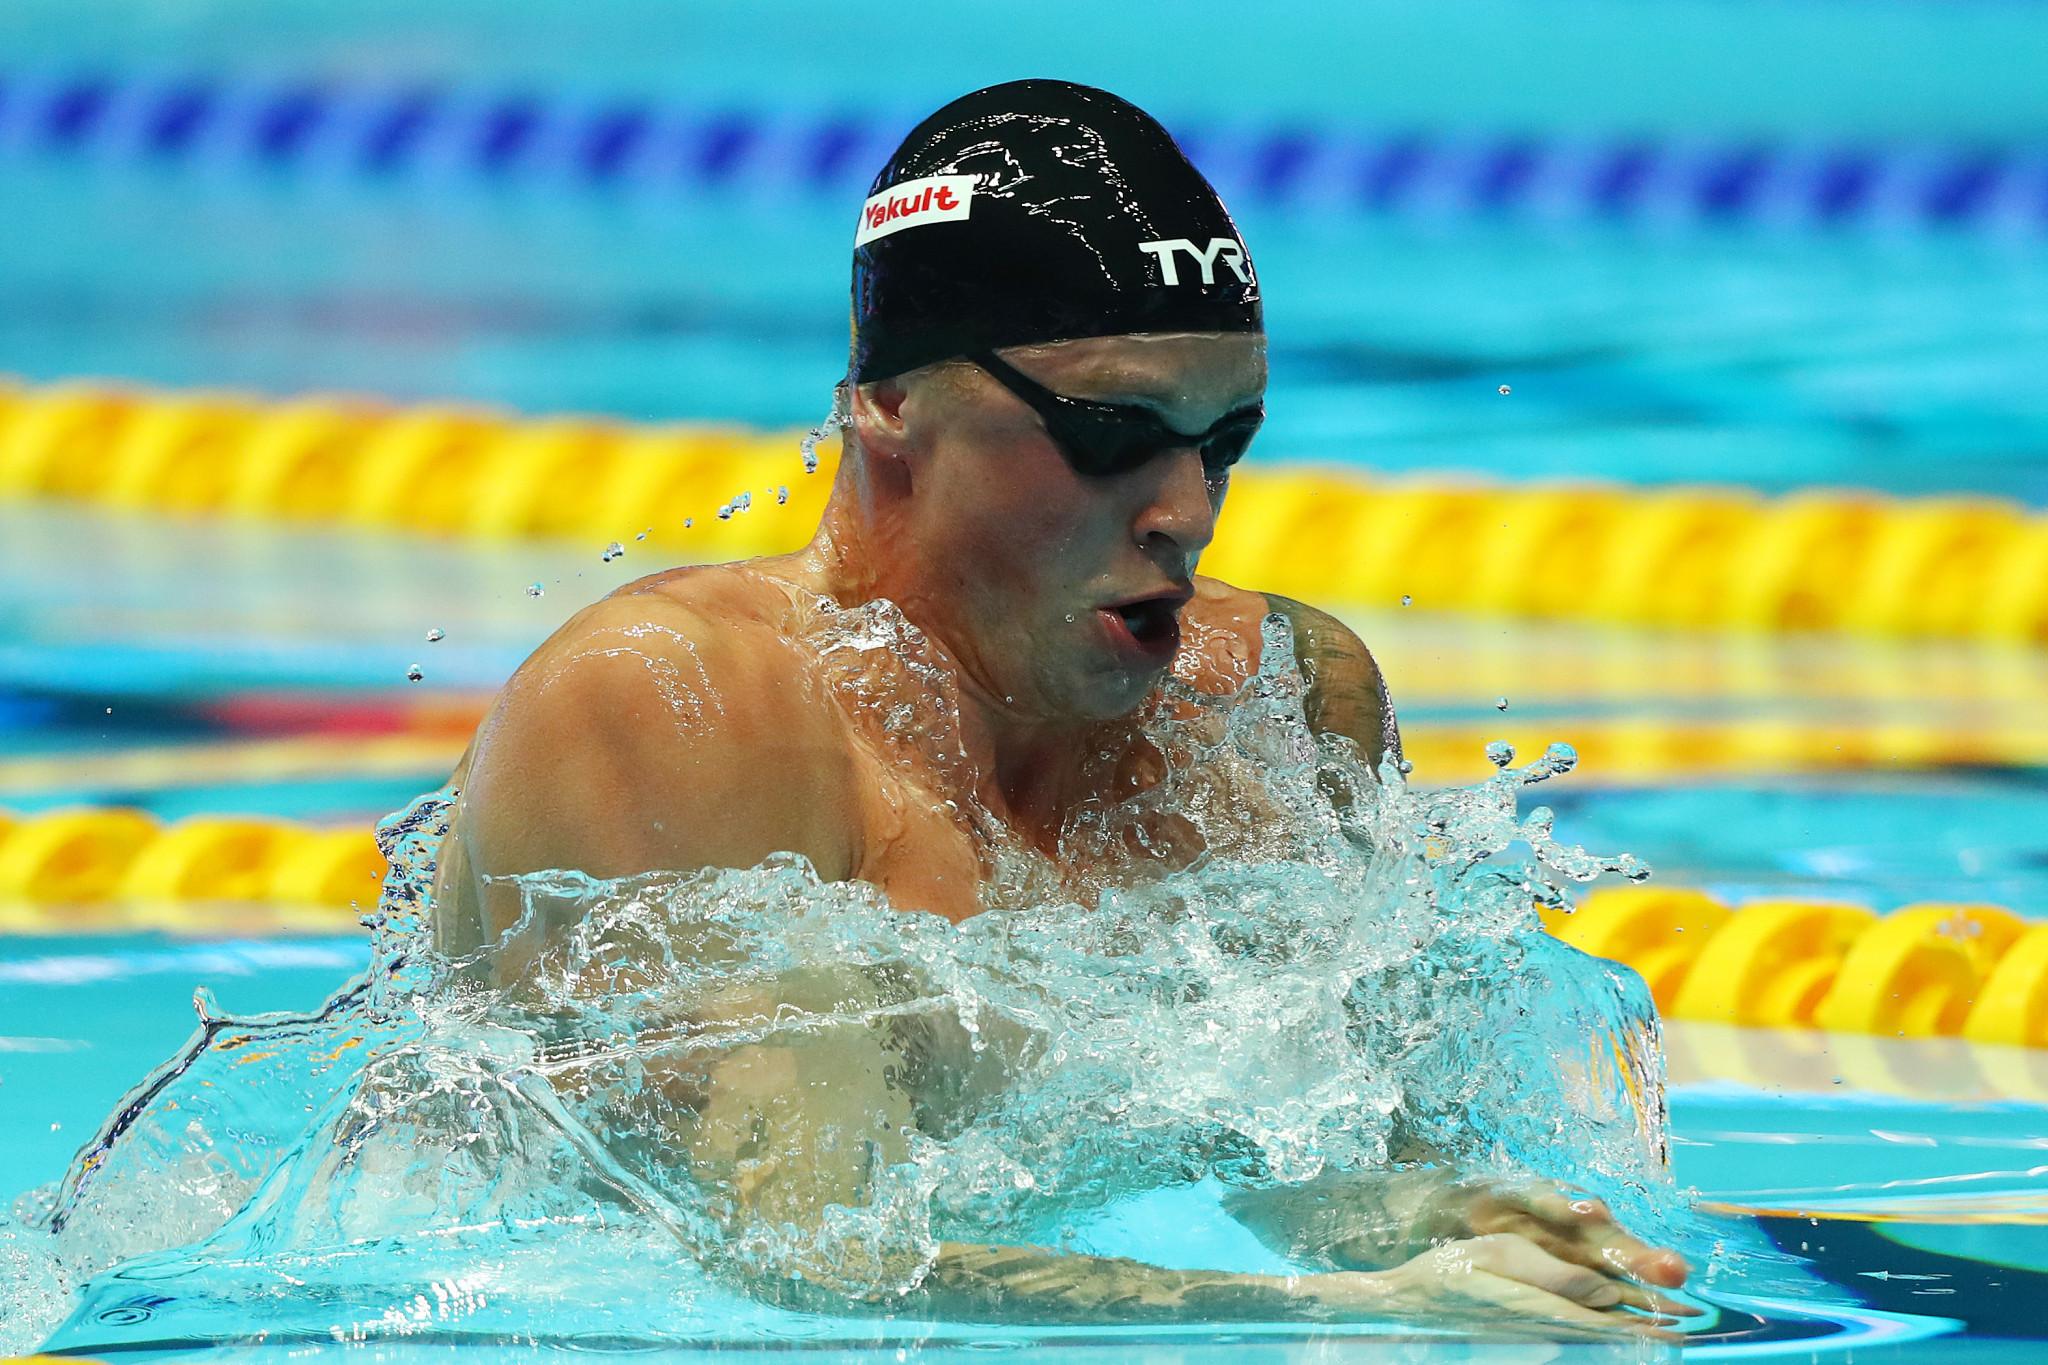 Adam Peaty of Britain set a world record of 56.88 seconds in winning his 100m breaststroke semi-final in Gwangju ©Getty Images